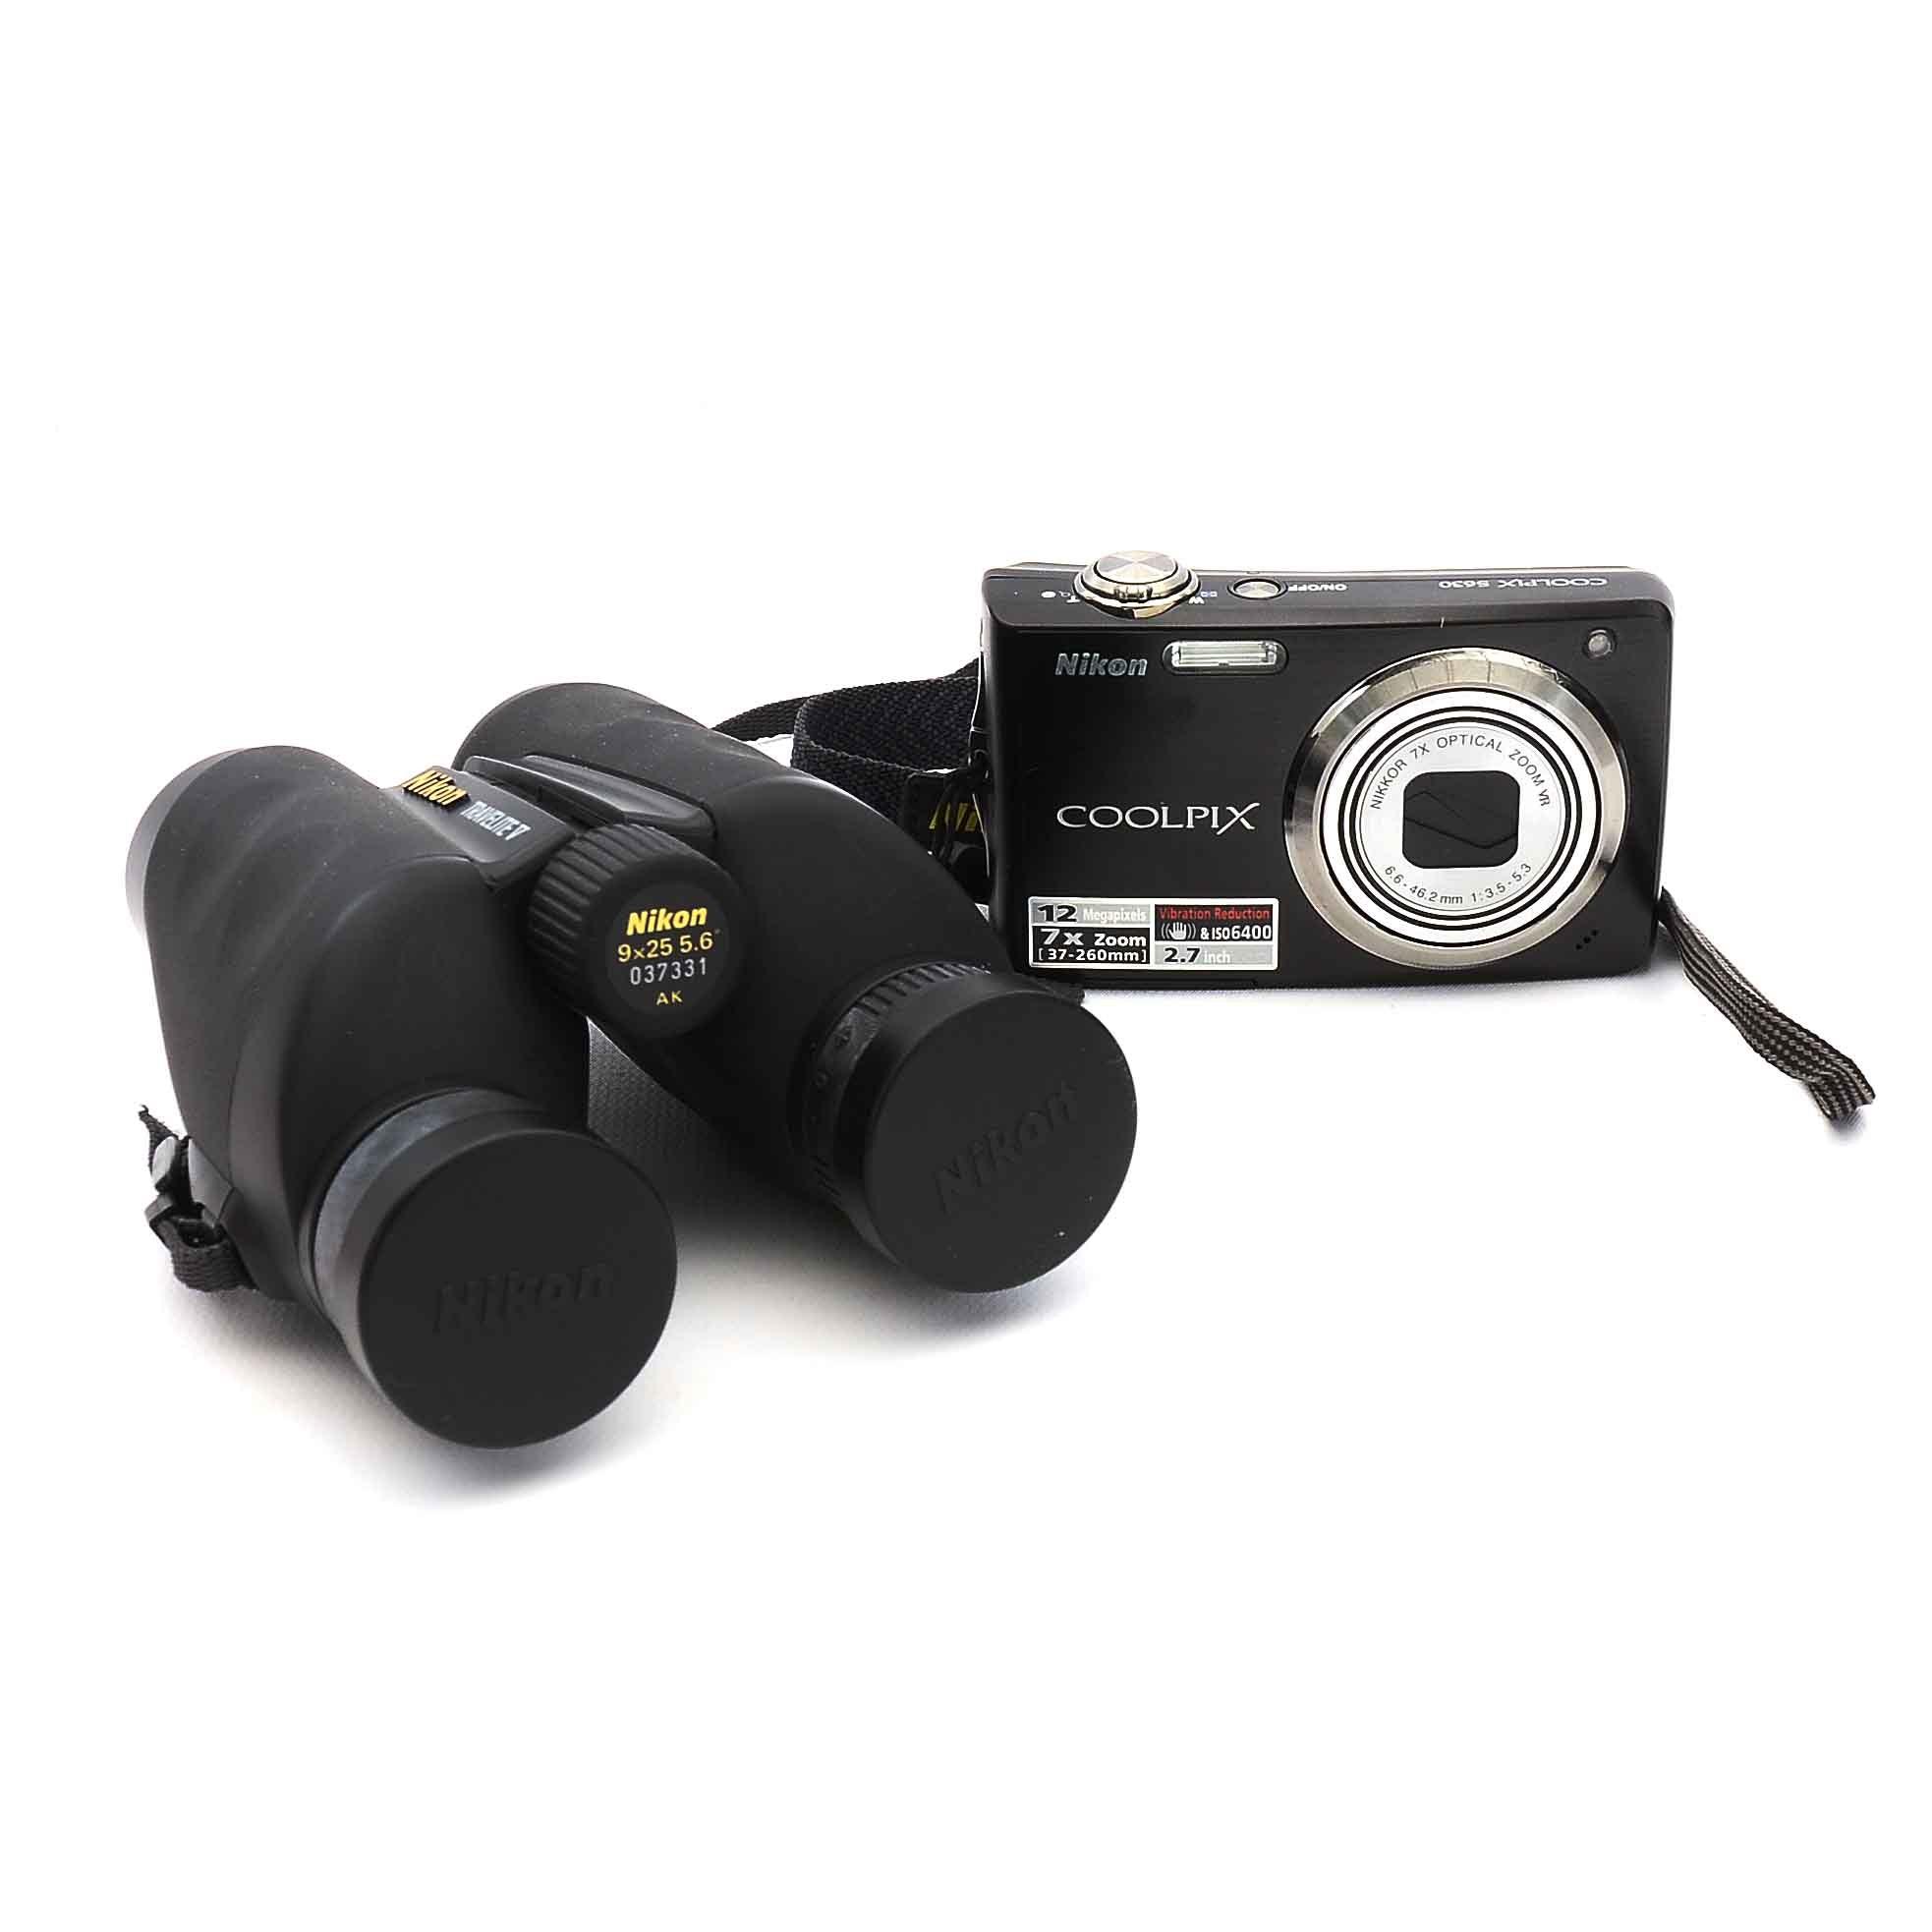 Nikon Digital Camera, Binoculars and Lithium Battery Charger